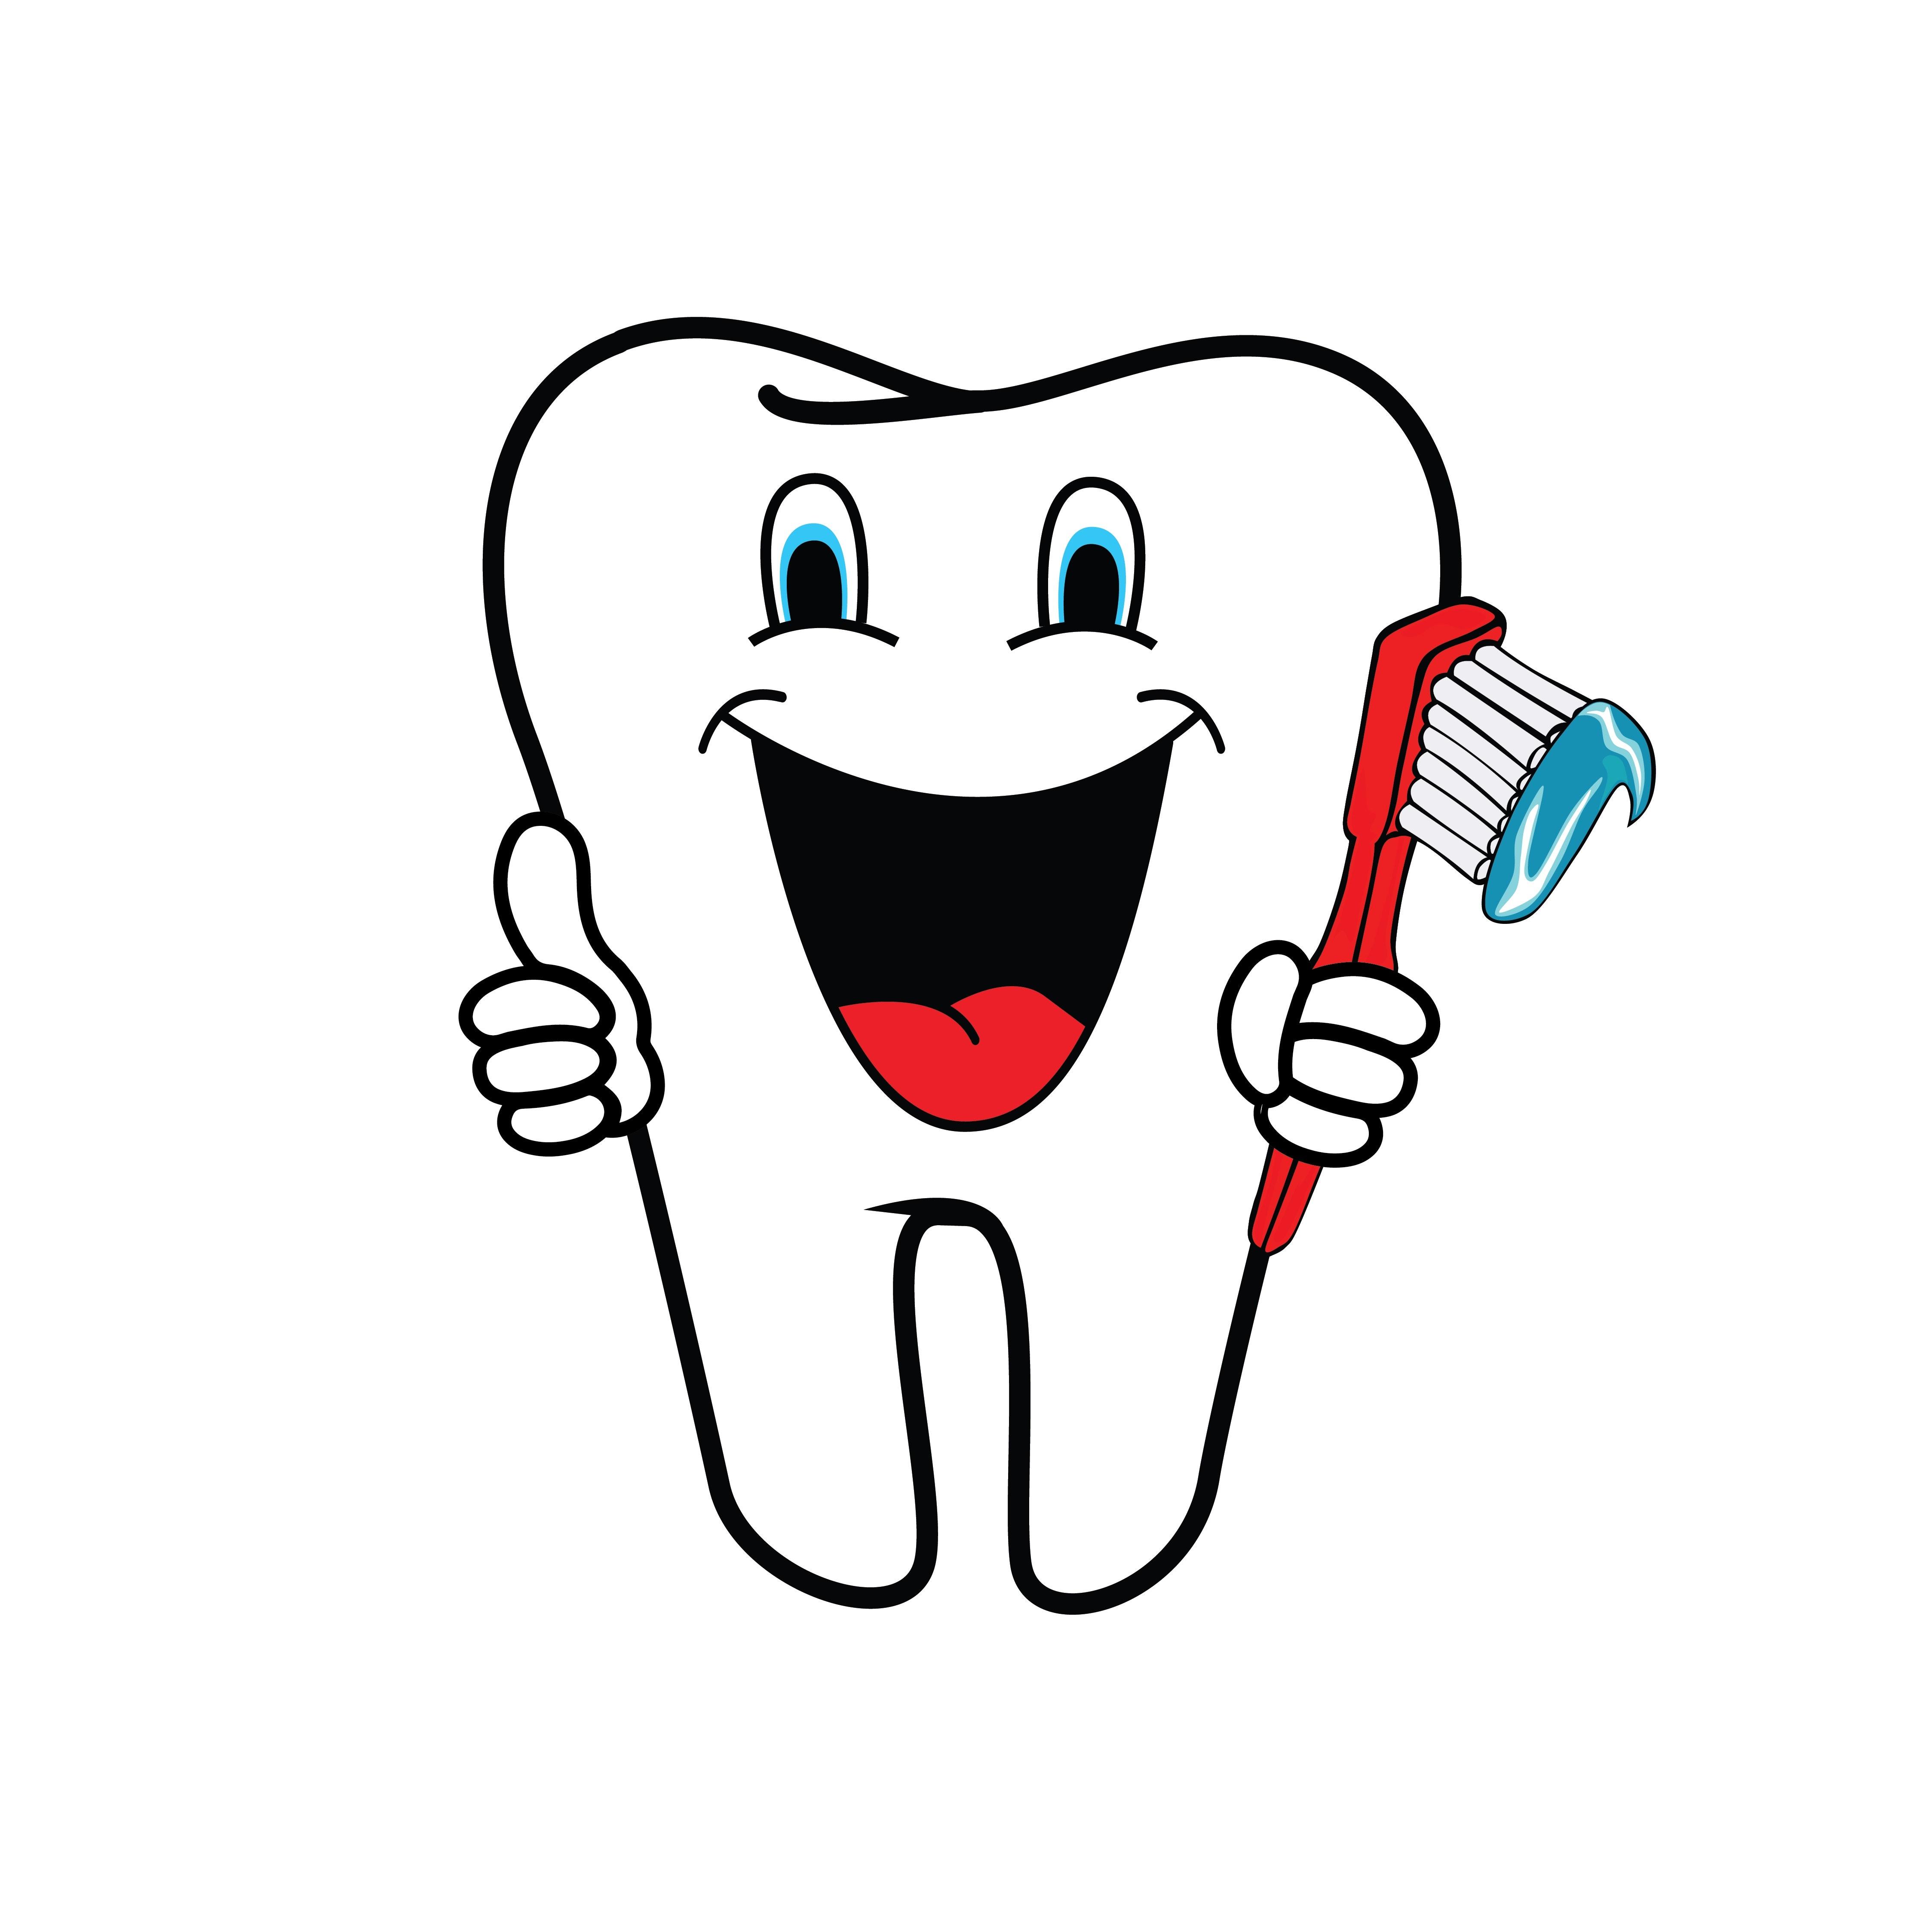 Free stock photo of. Health clipart dental health